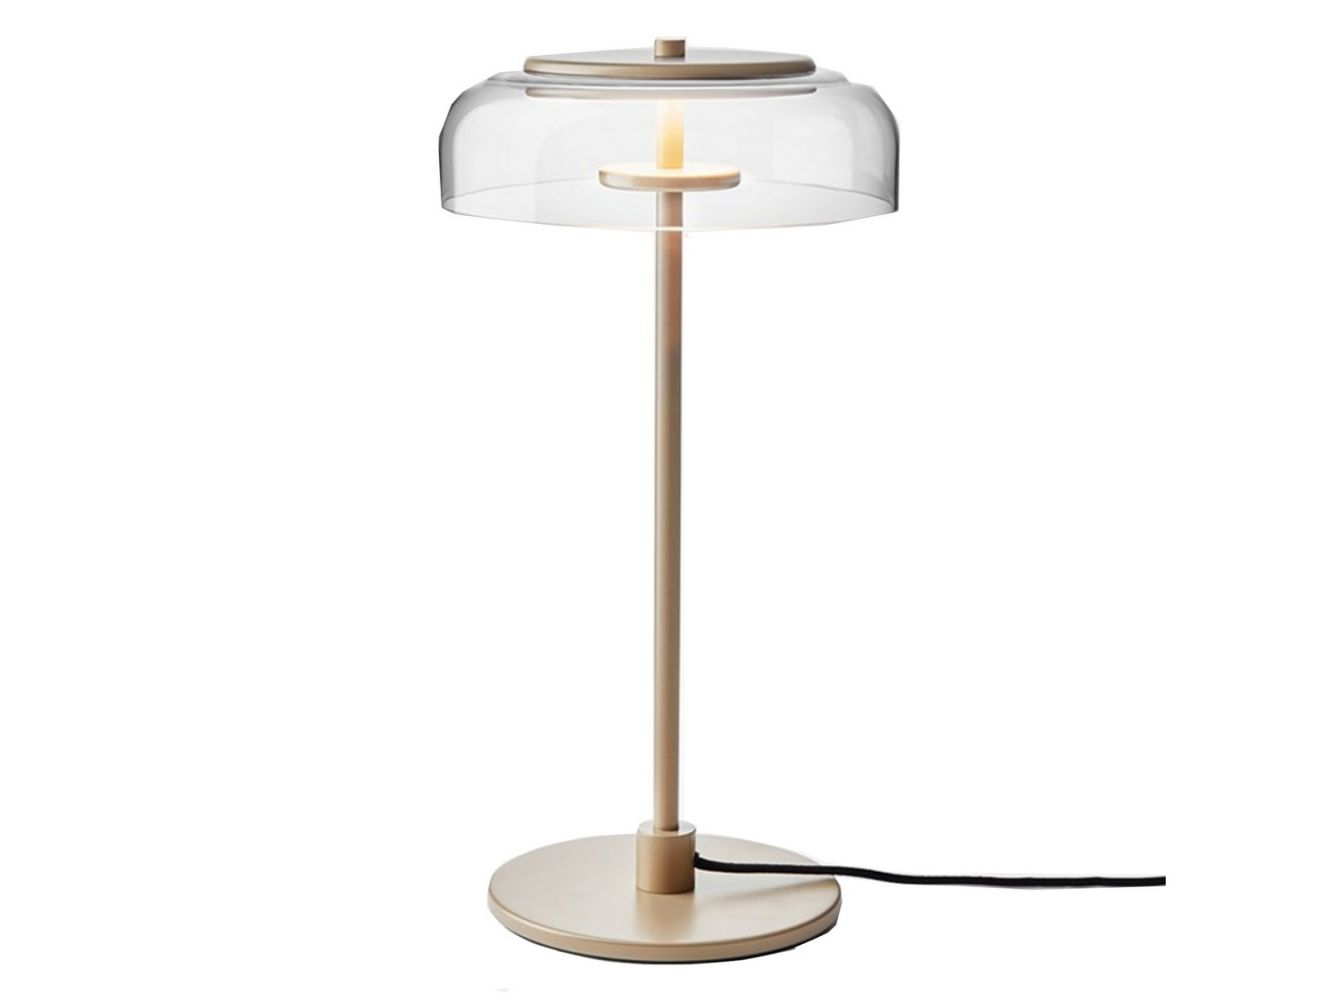 Ecolight Deco 003789